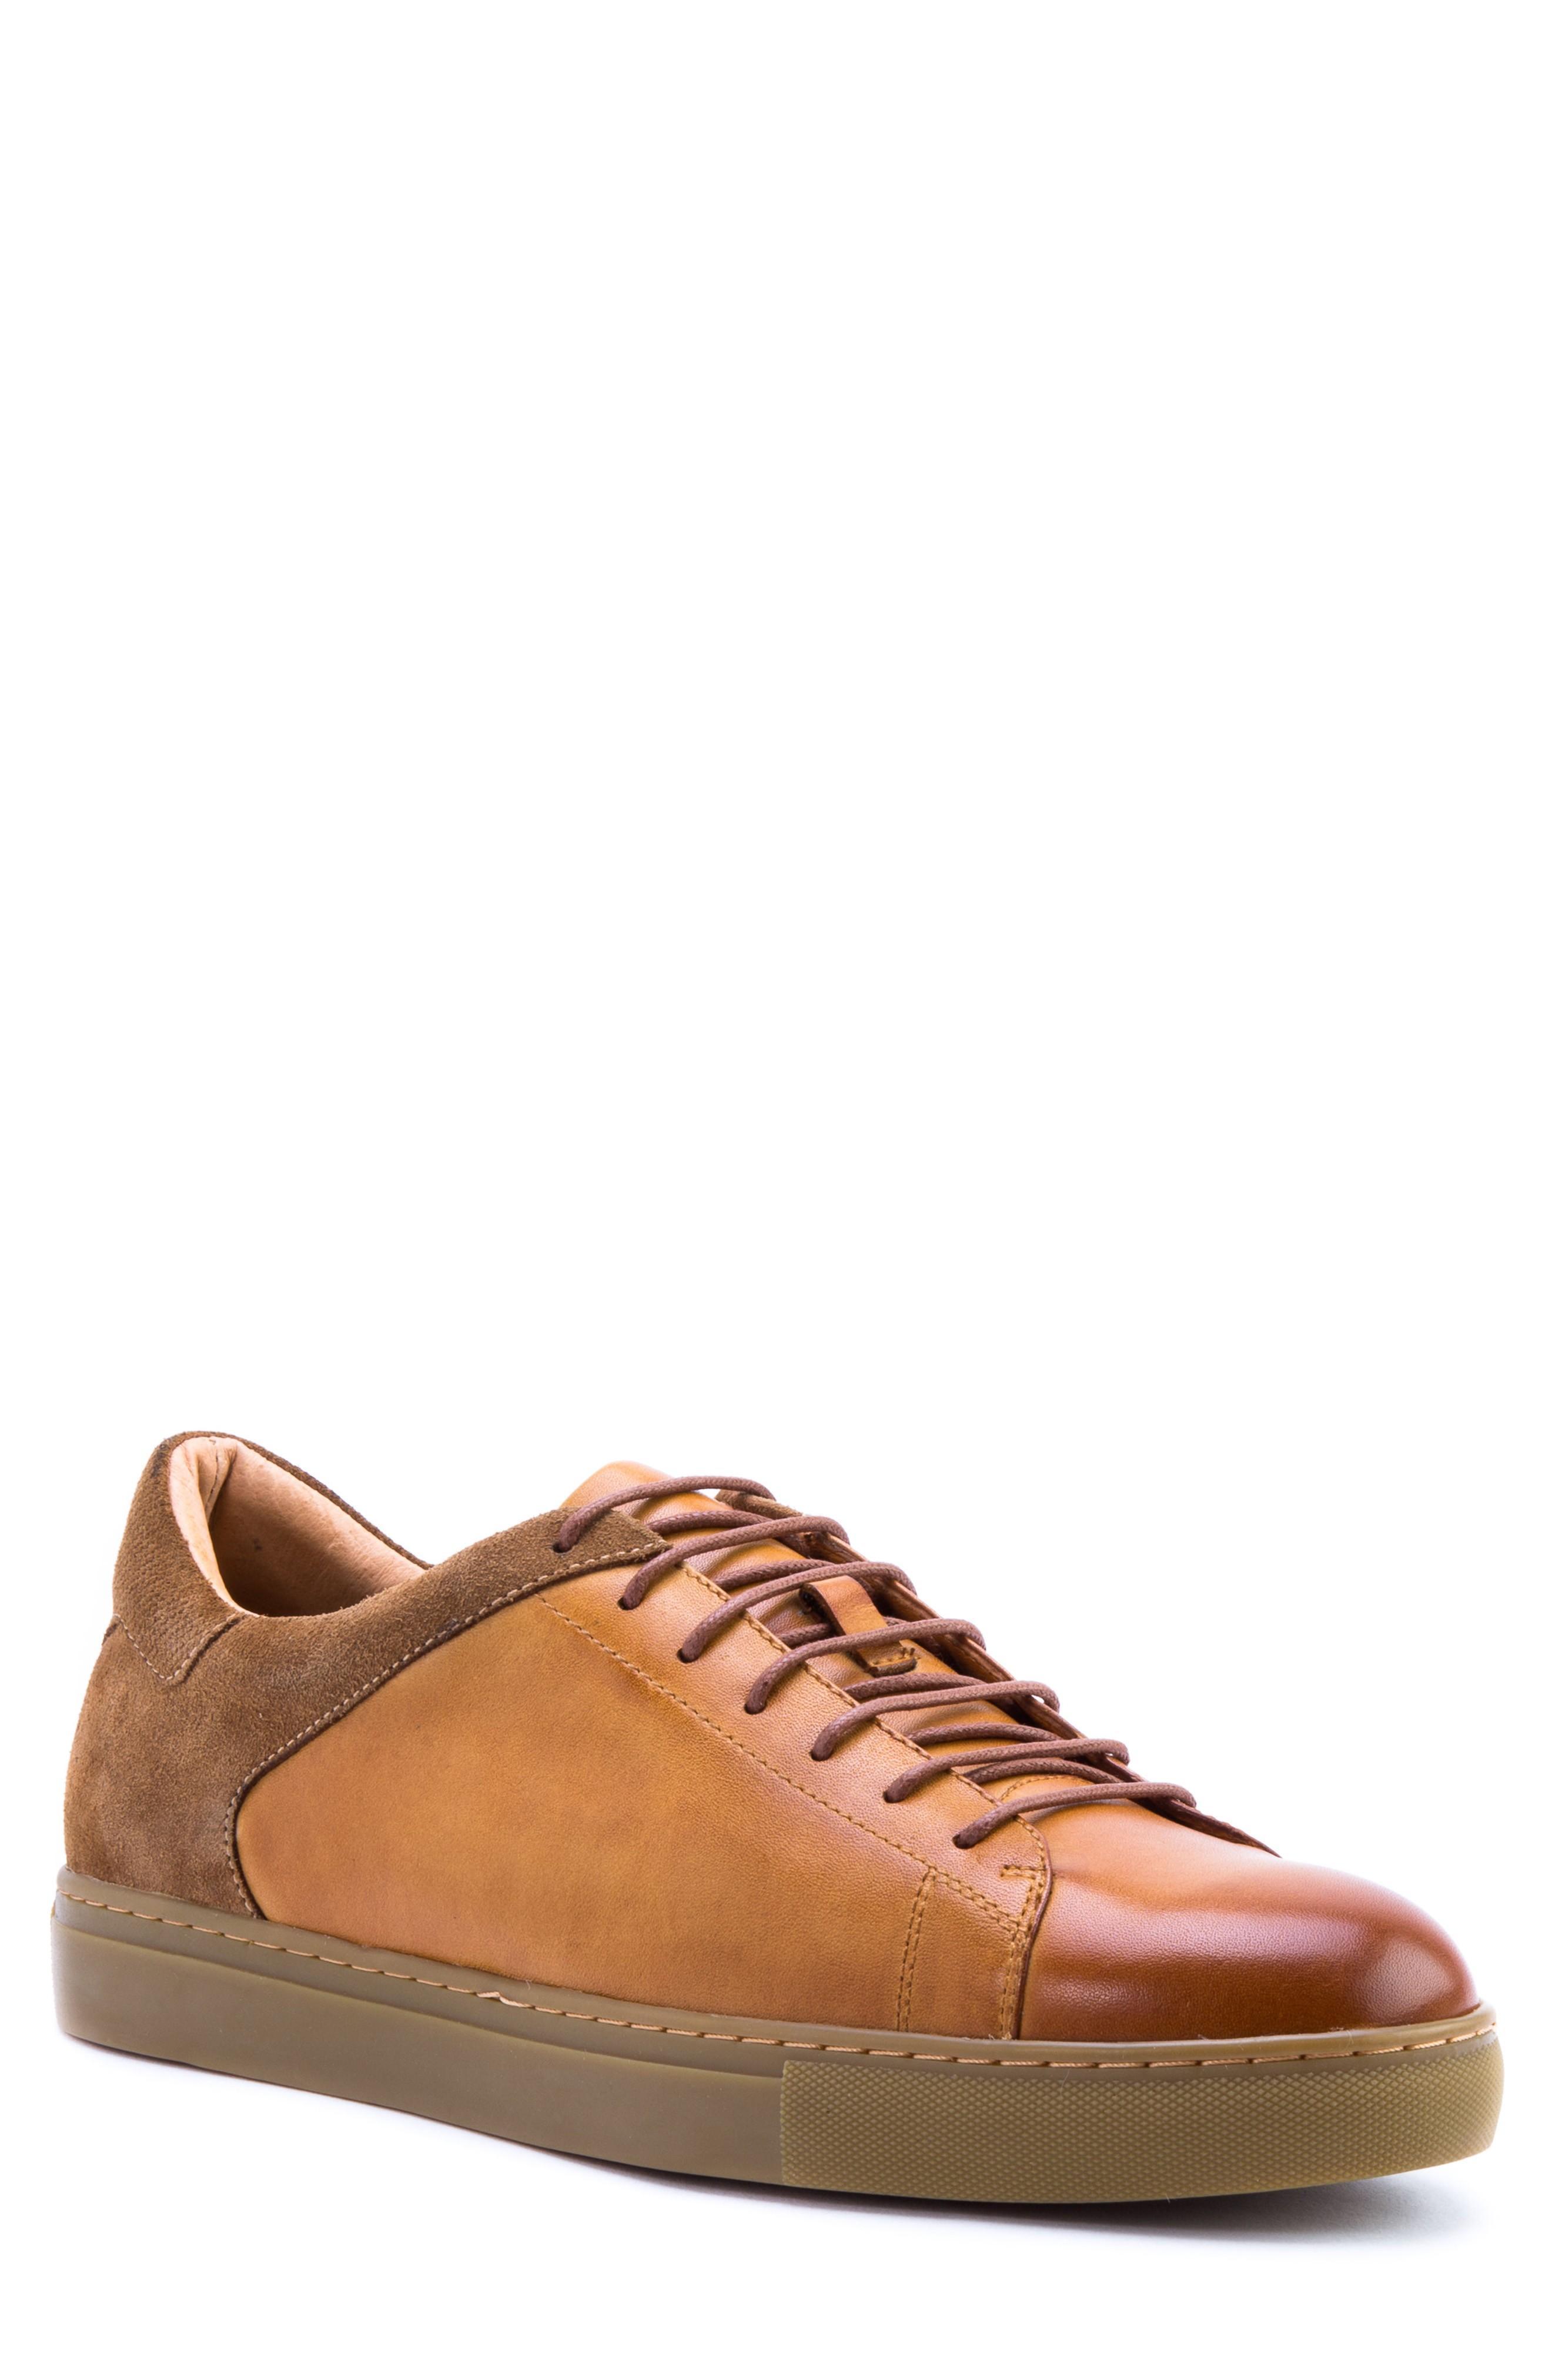 Zanzara Cue Low Top Sneaker In Cognac Leather/ Suede